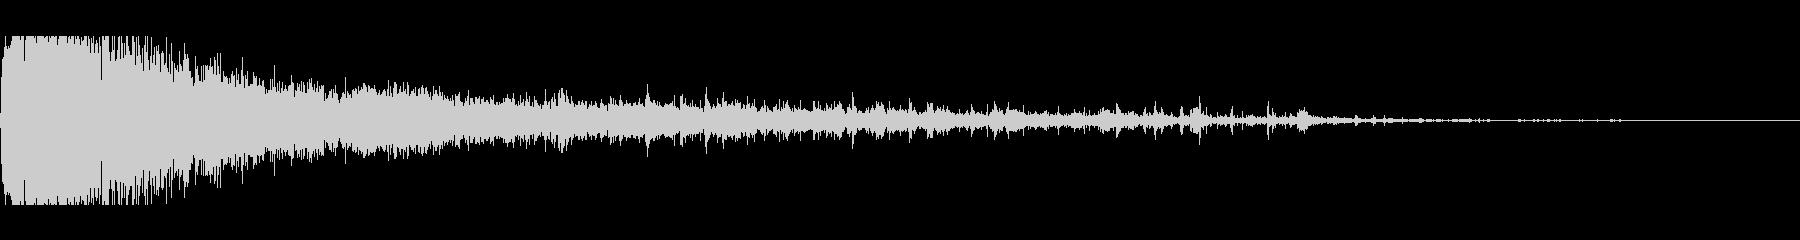 MEDIUM C4 BLAST:ヘ...の未再生の波形